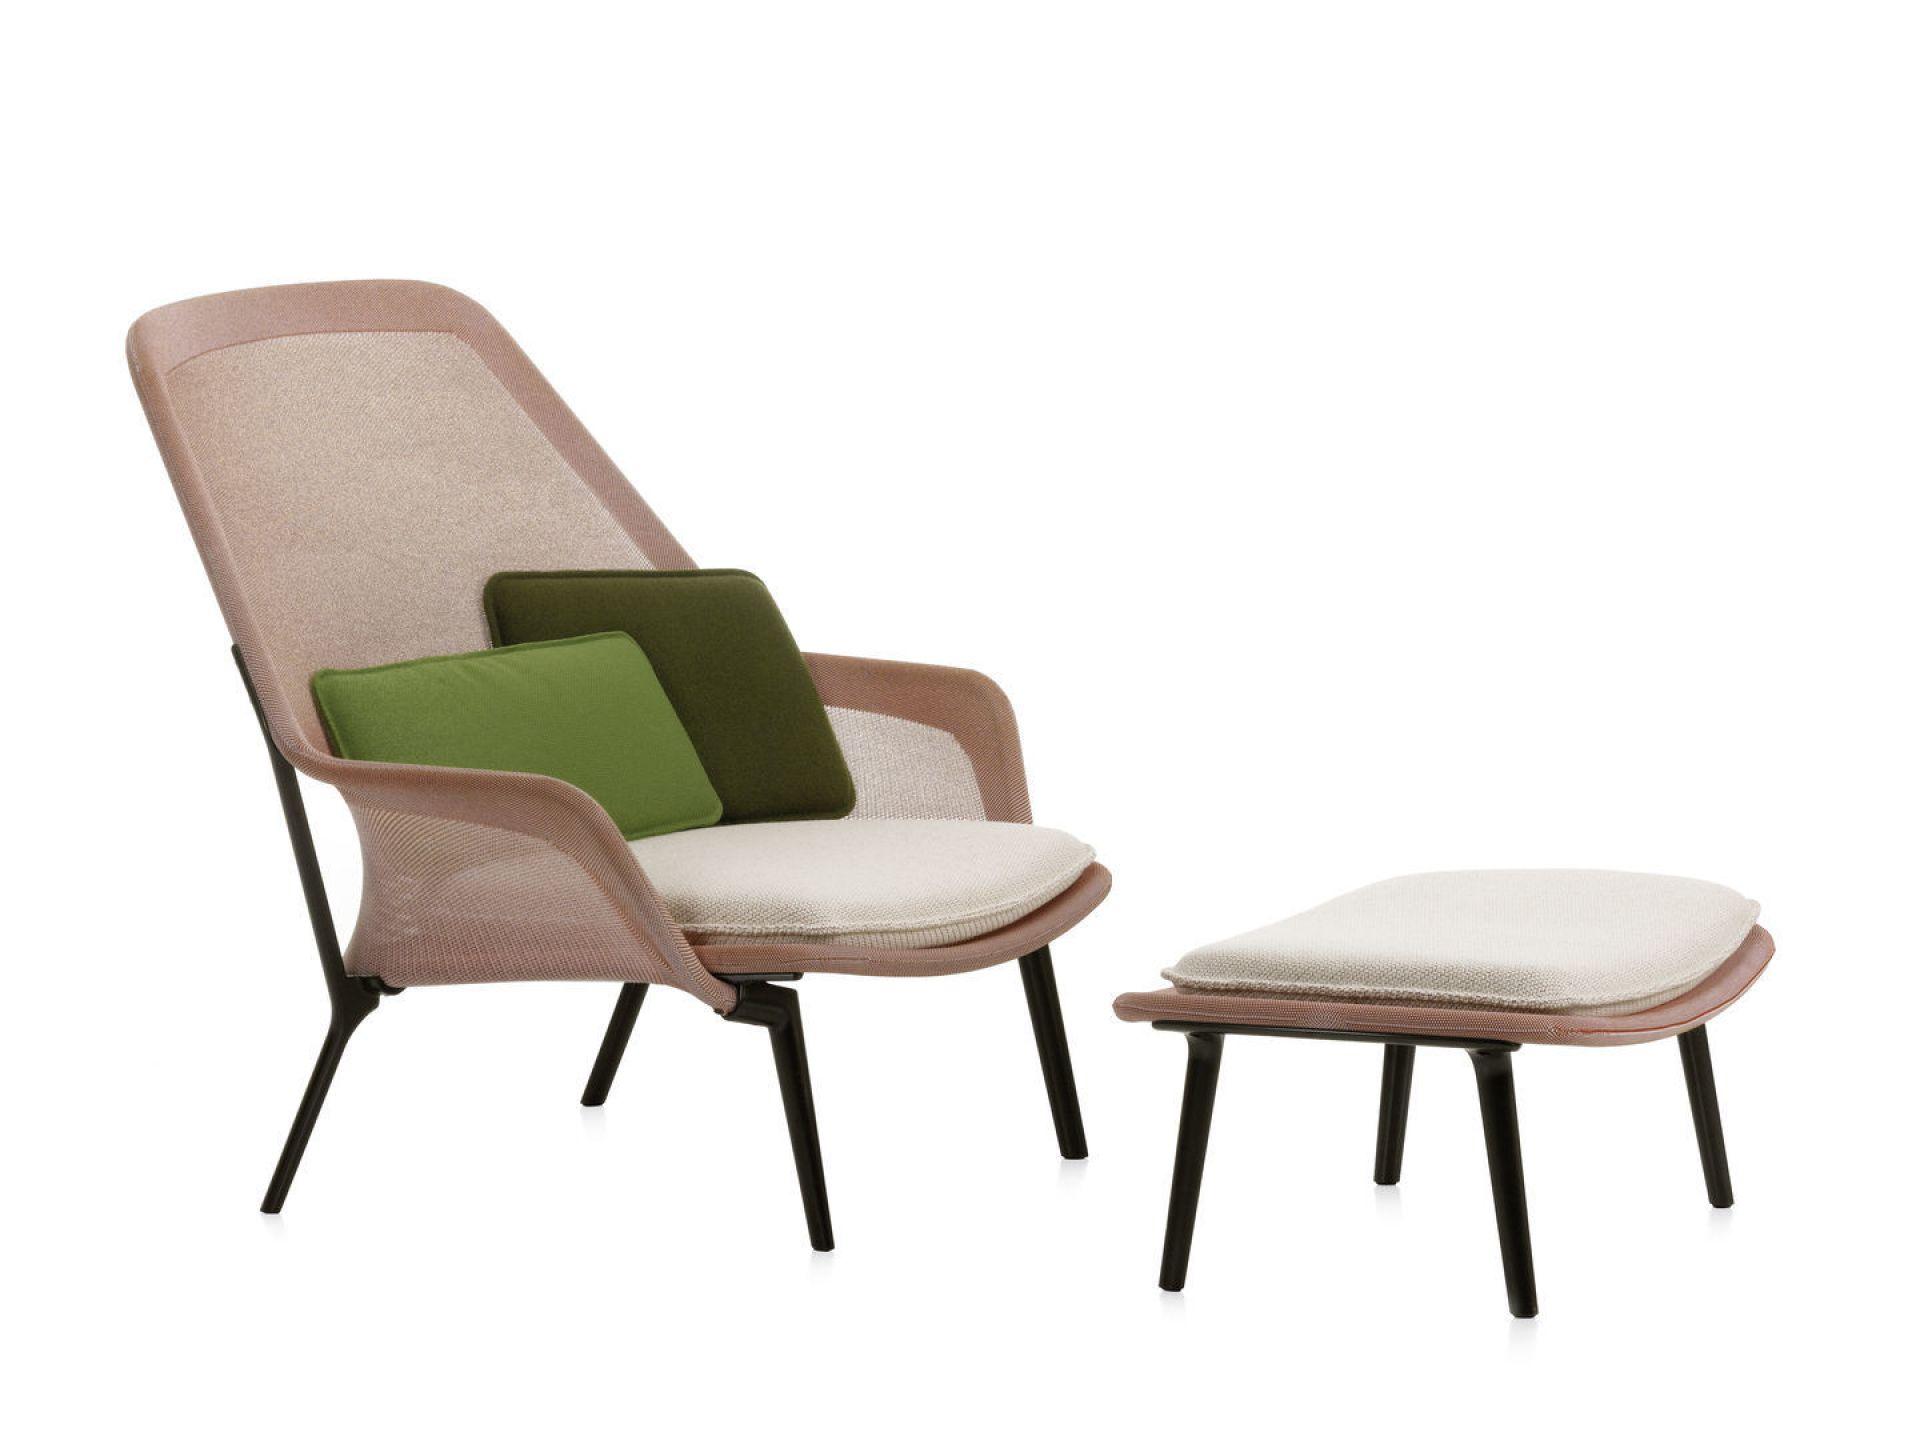 Slow Chair & Ottoman Sessel Vitra